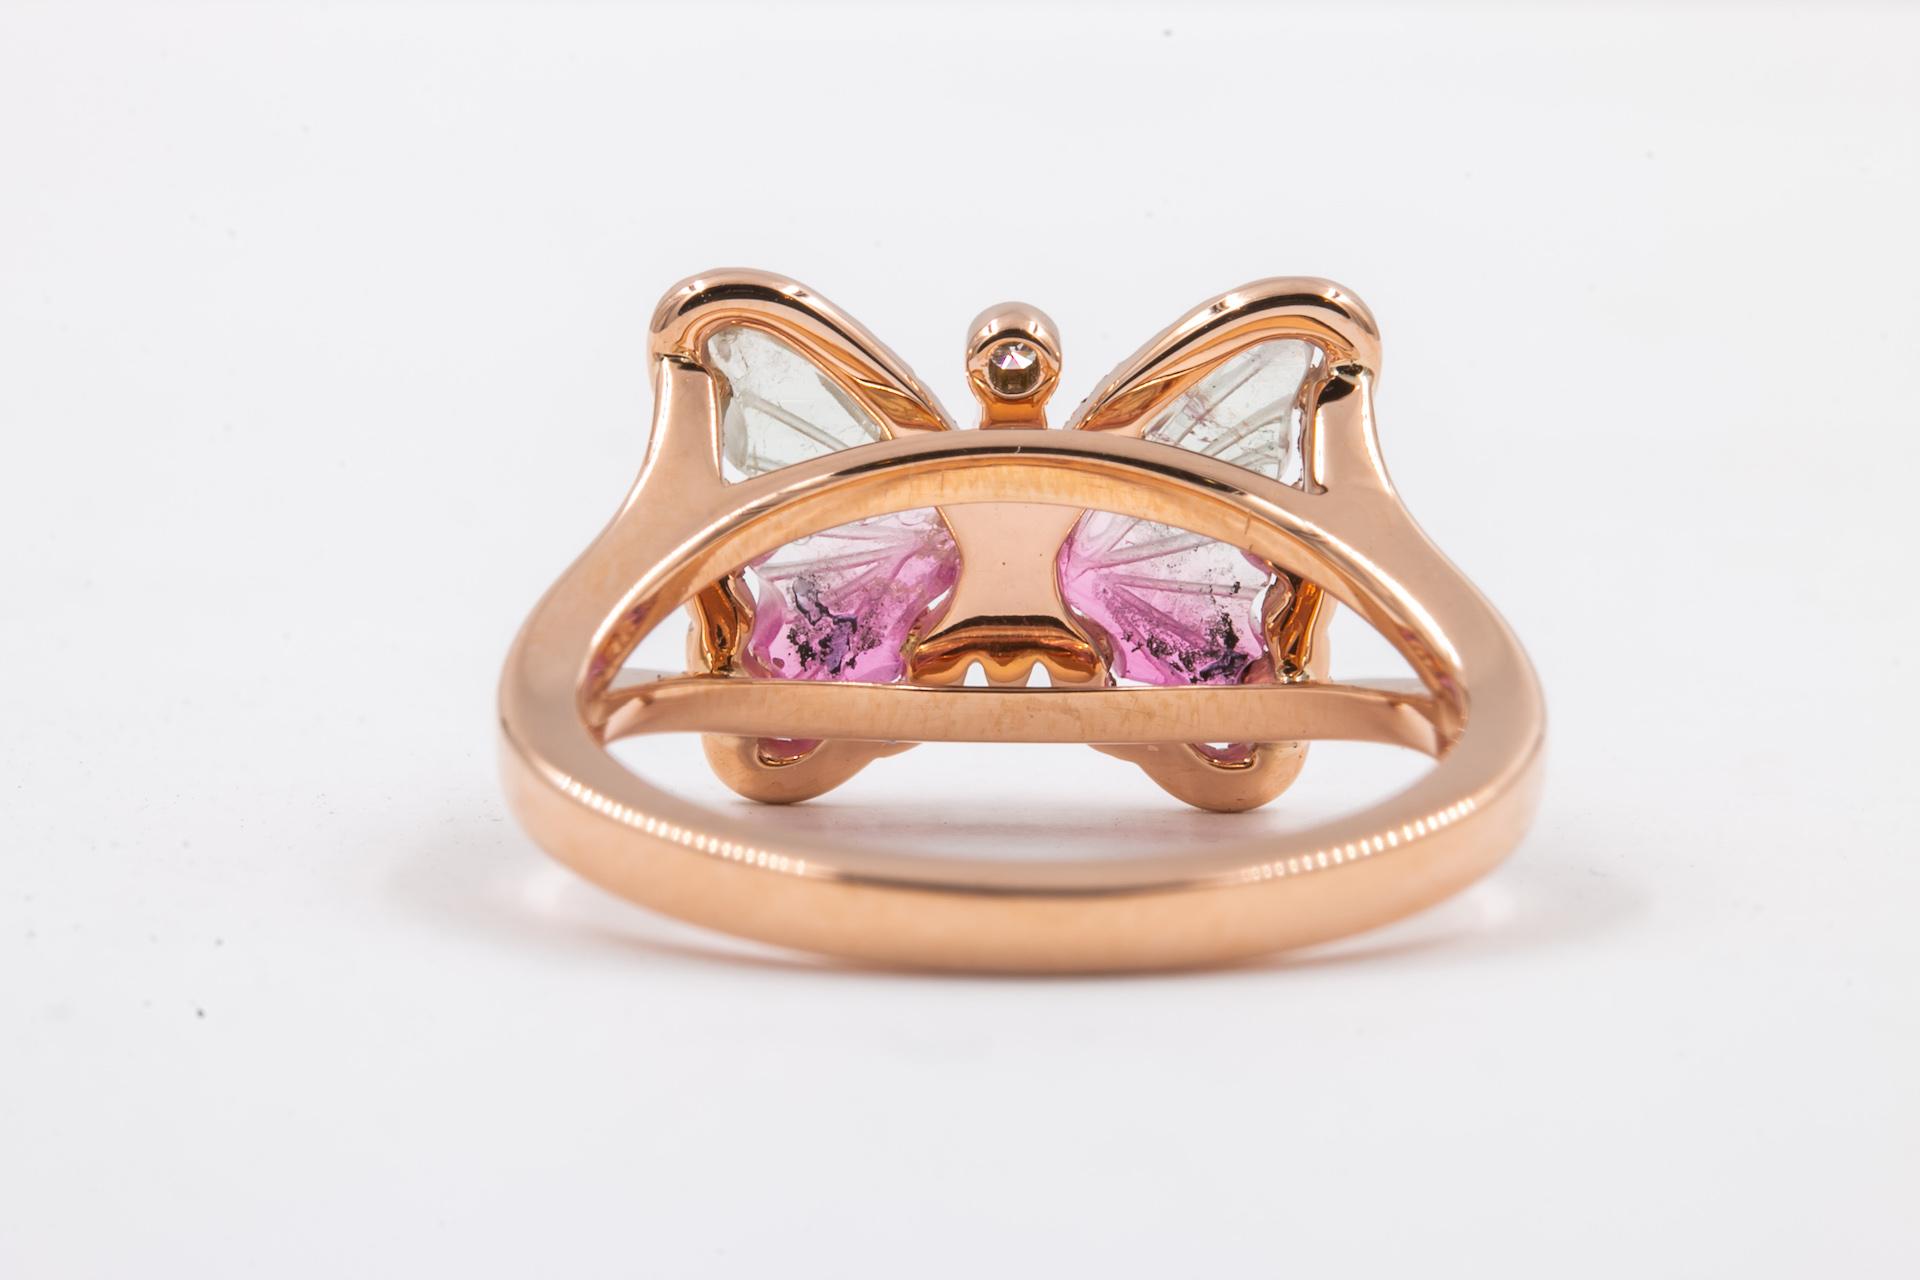 watermelon-tourmaline-ring-butterfly-jewelry-diamonds-3